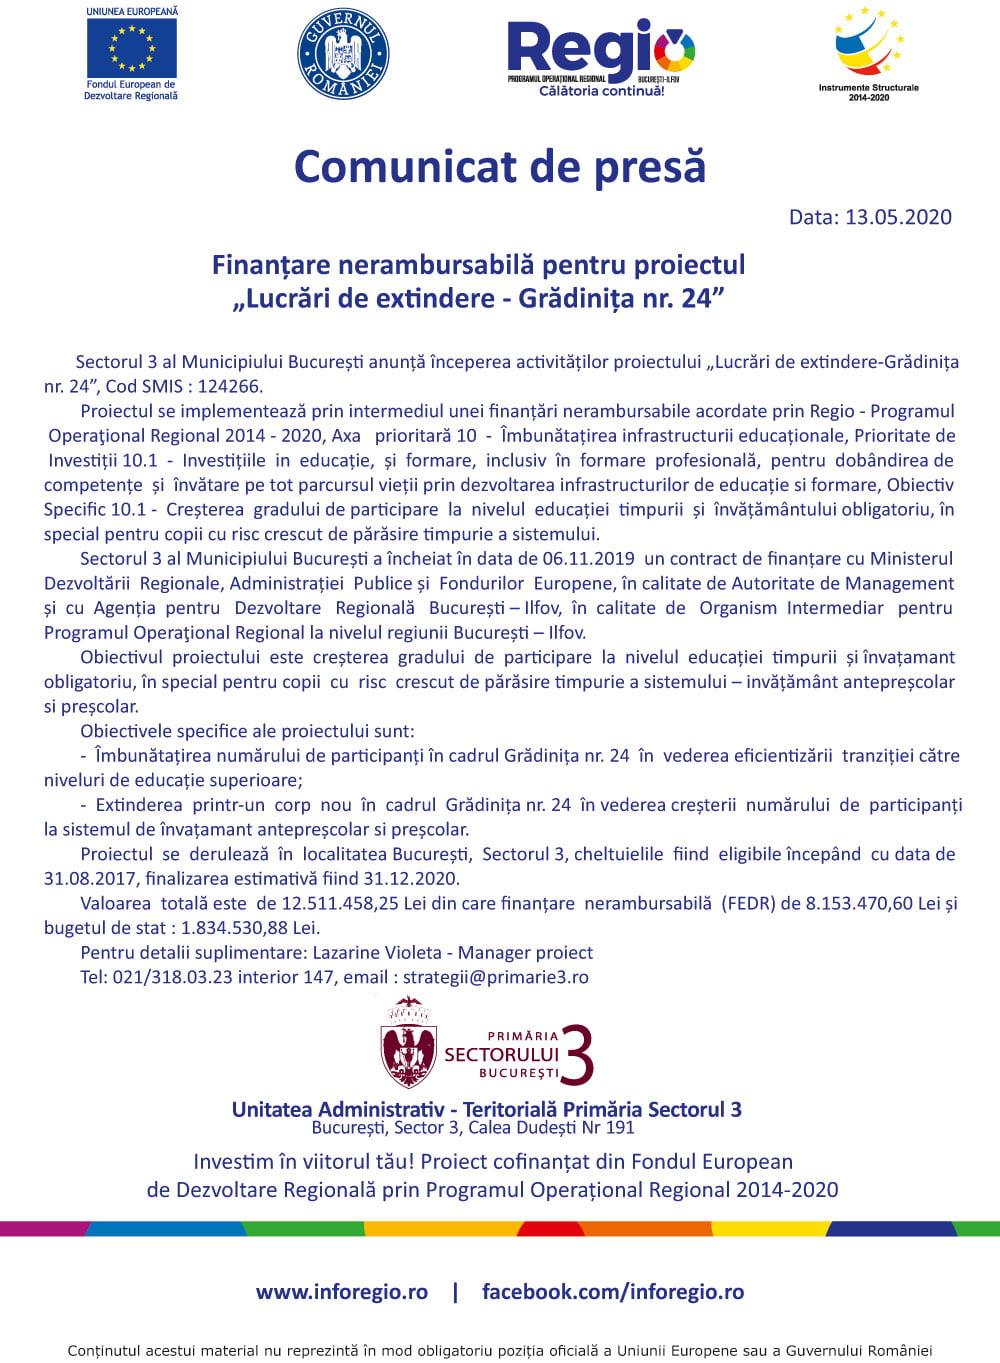 anunt-gradinita-24-13052020